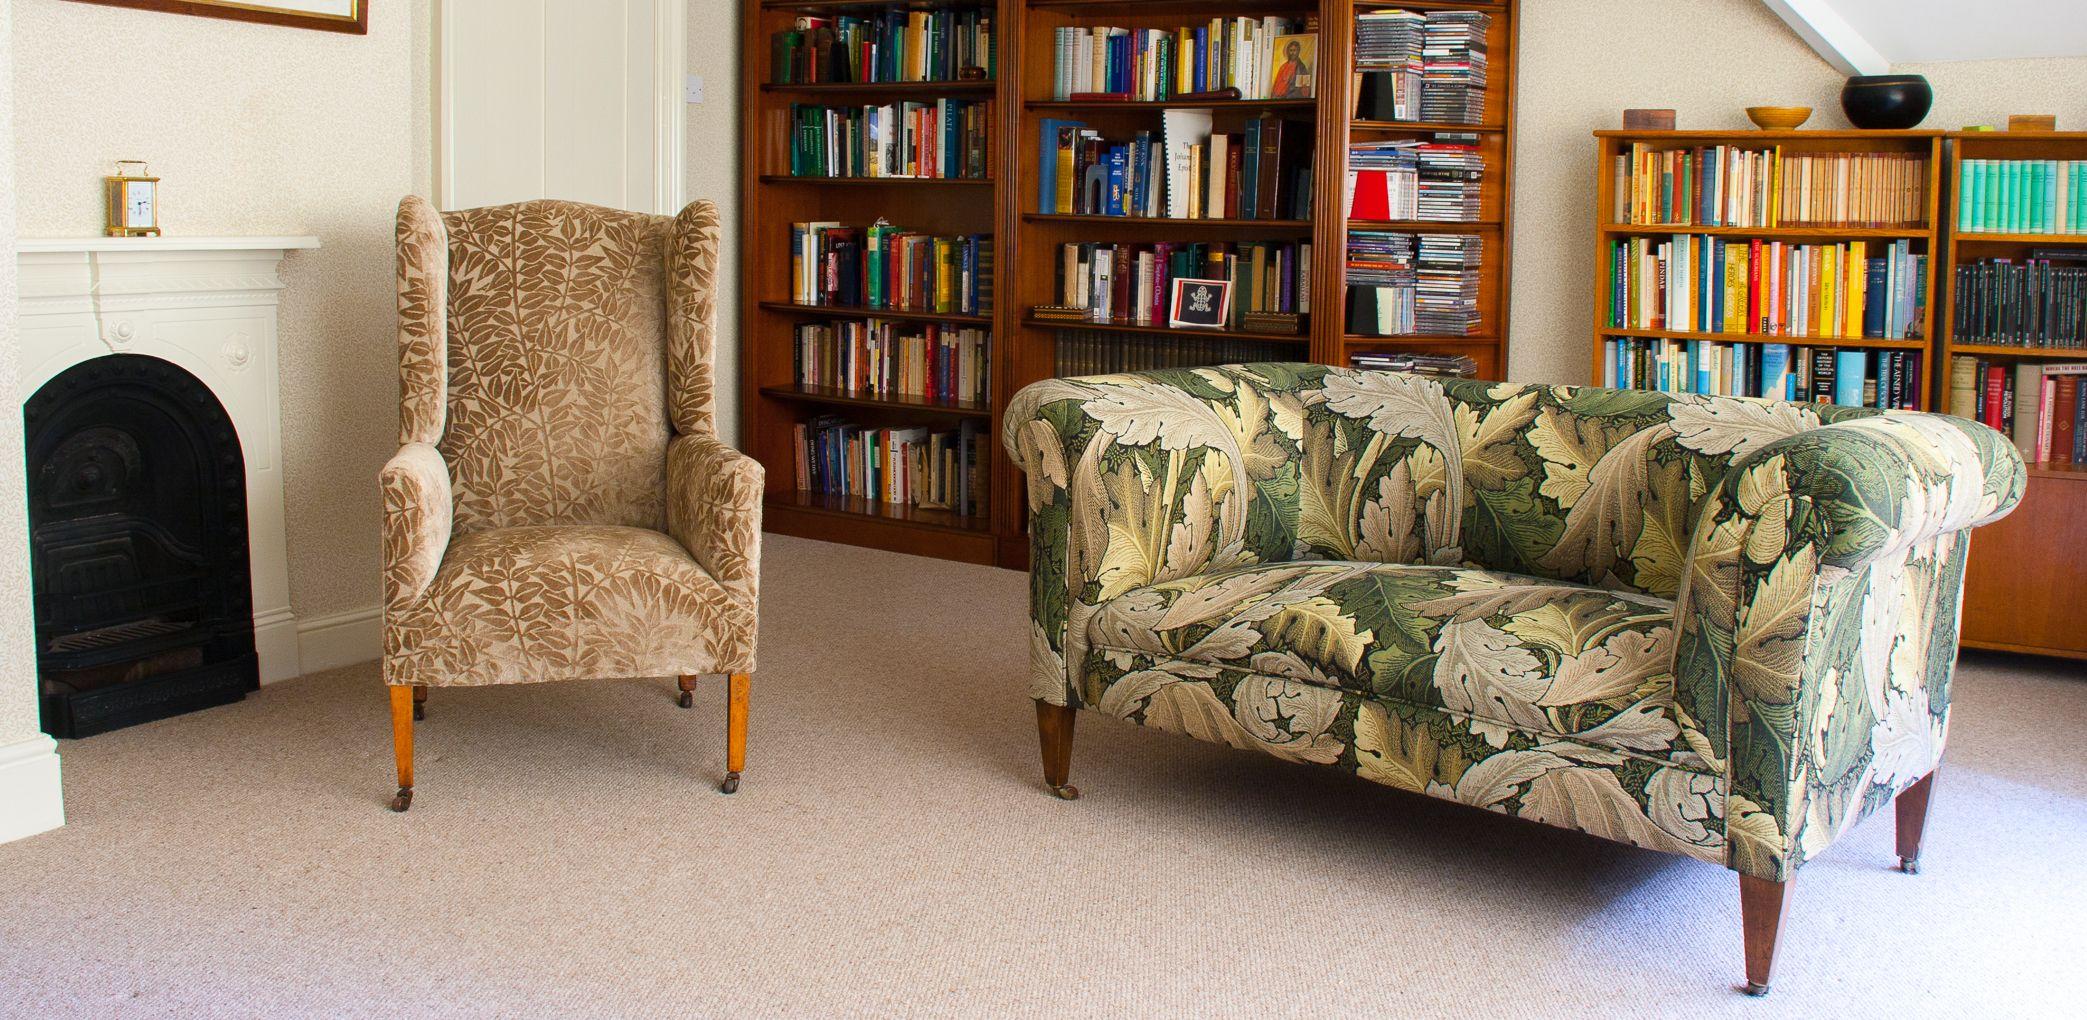 Tapestry Sofa Living Room Furniture Edwardian Drop Arm Sofa Upholstered In William Morris Acanthus